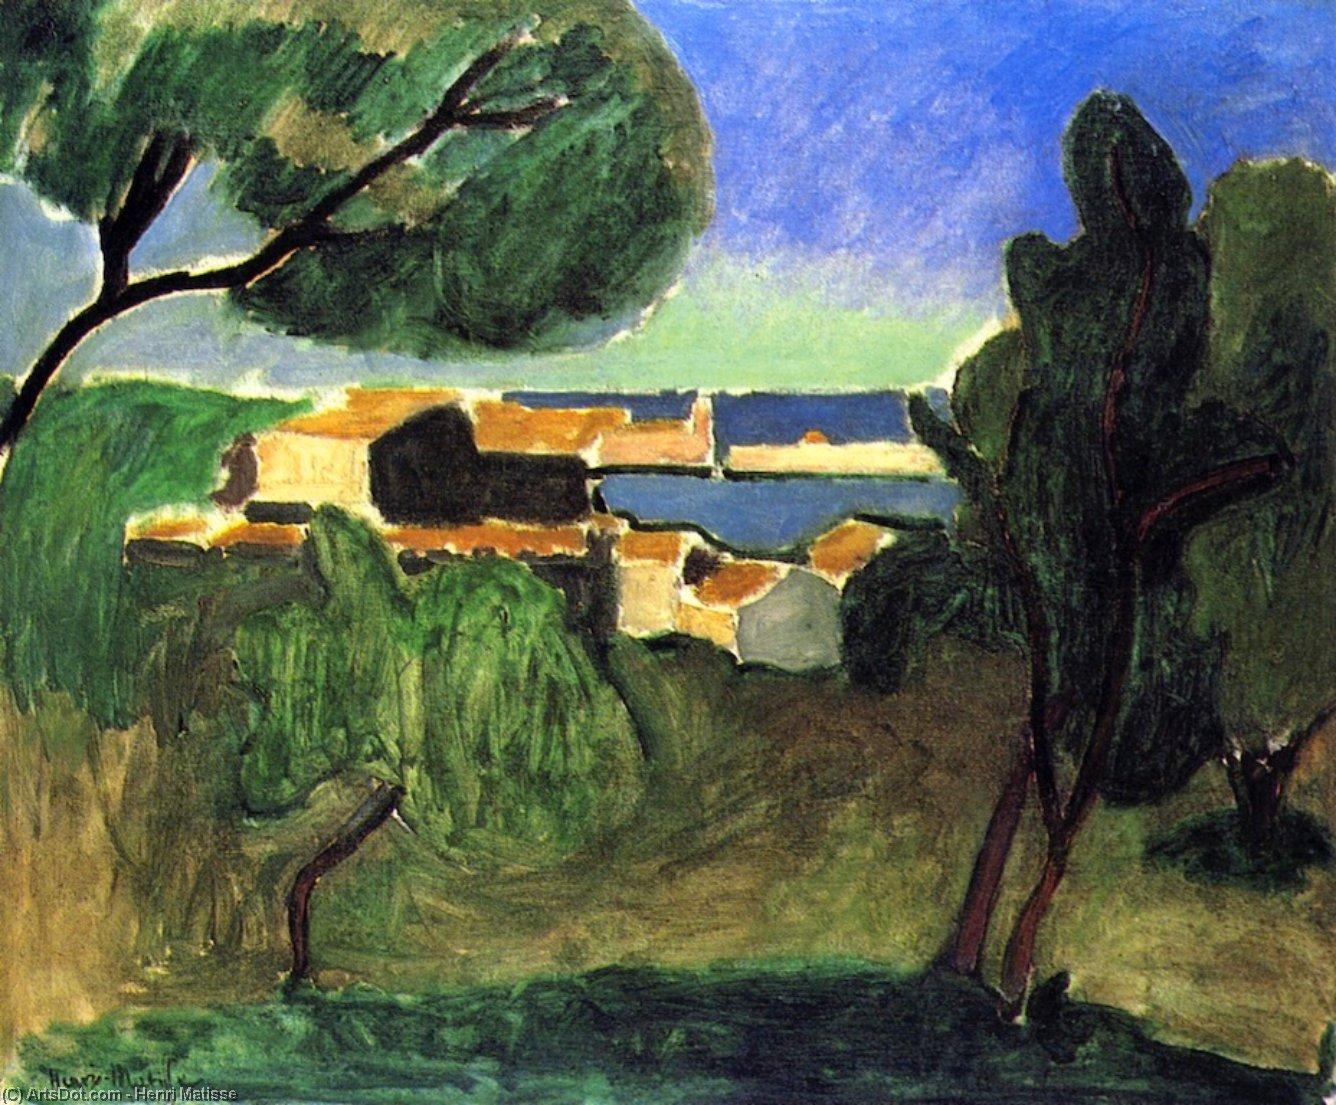 paesaggio a collisione, 1907 di Henri Matisse 1869 1954 ...